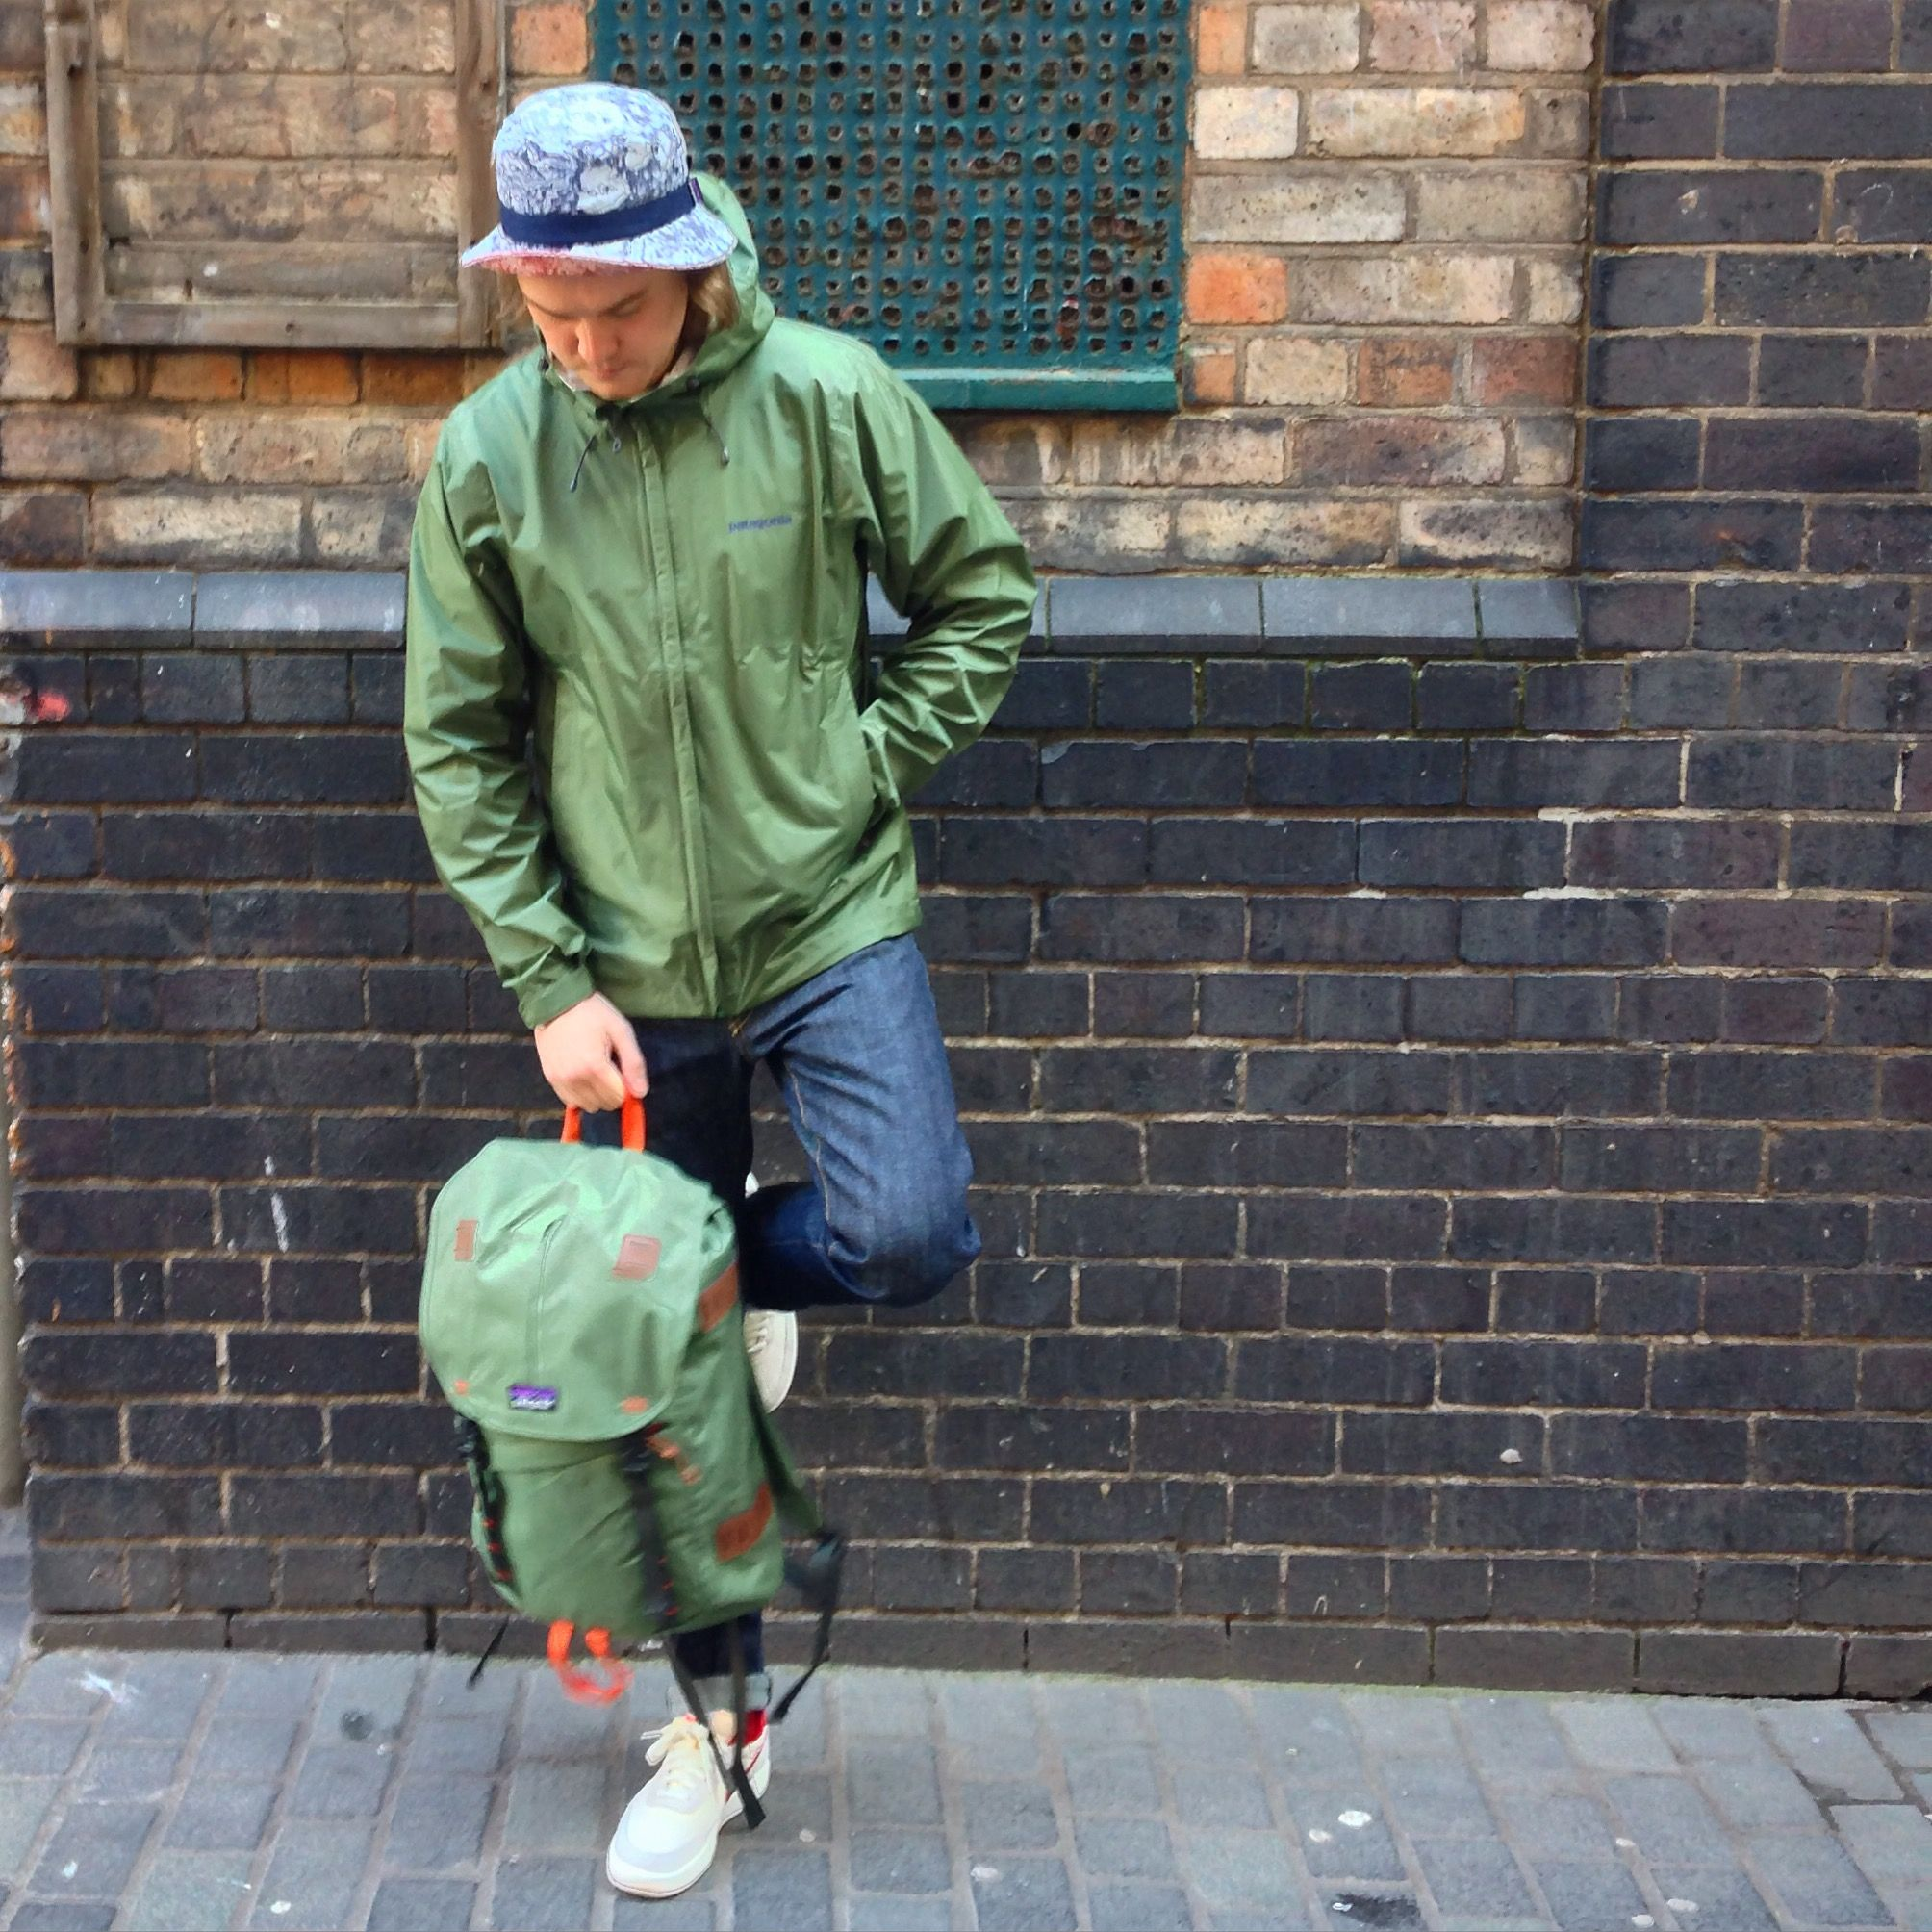 Chris wears; Patagonia Torrentshell Jacket in Camp Green, Wavefearer Bucket  Hat, Arbor 26L